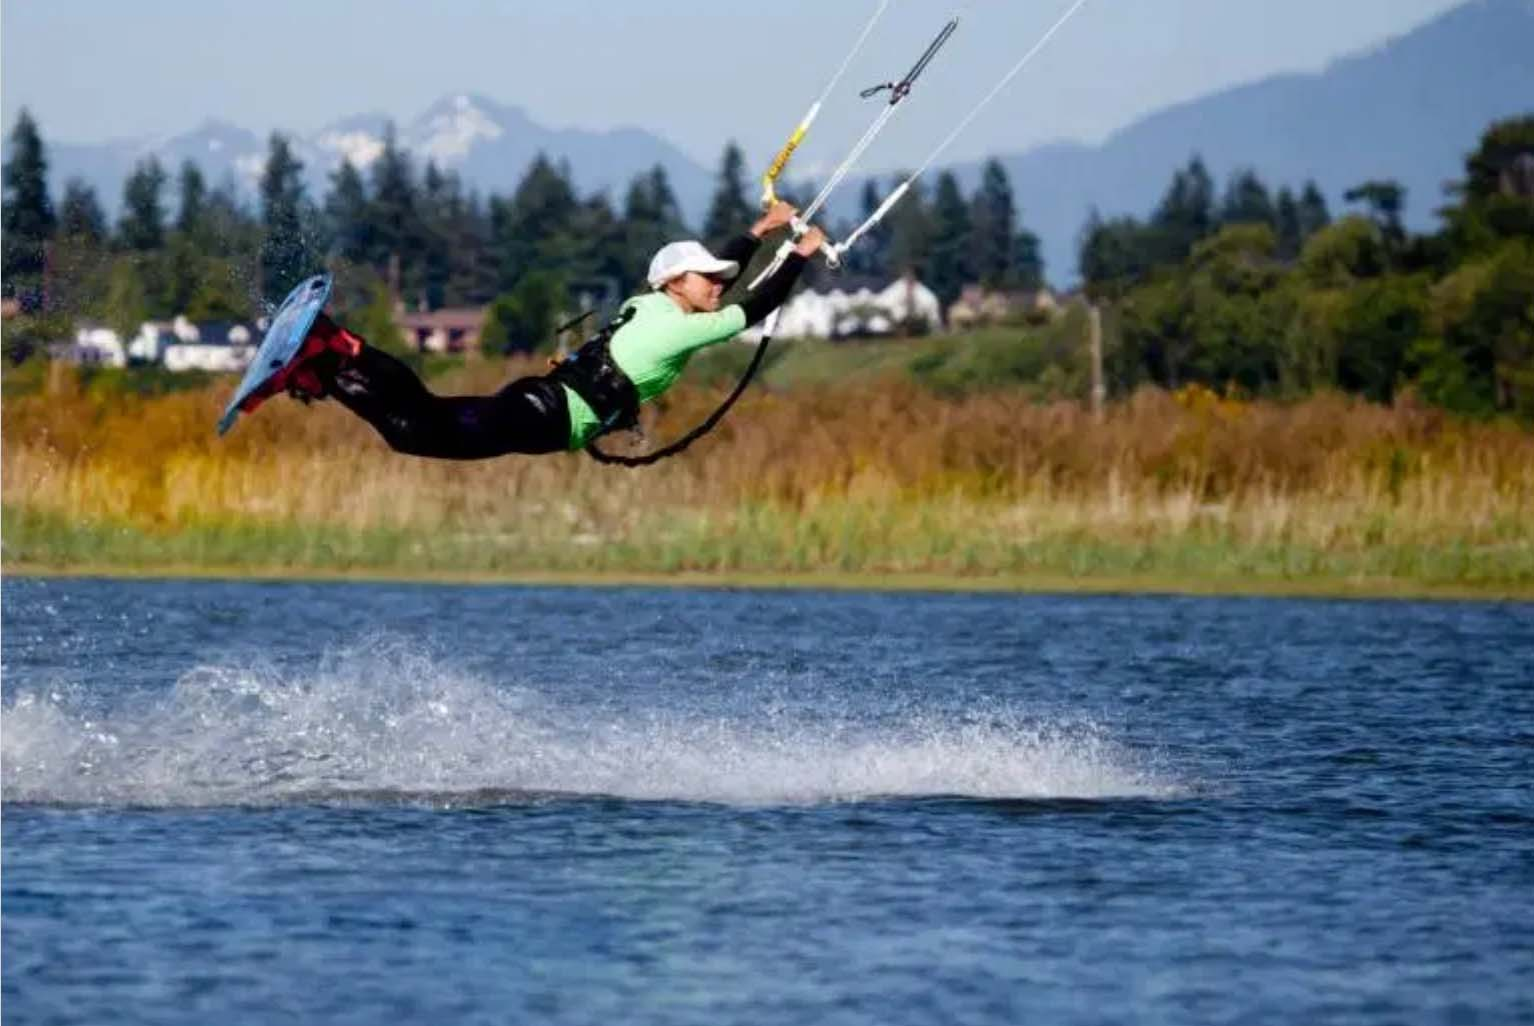 Jerry Island Usa Kite Surf competition